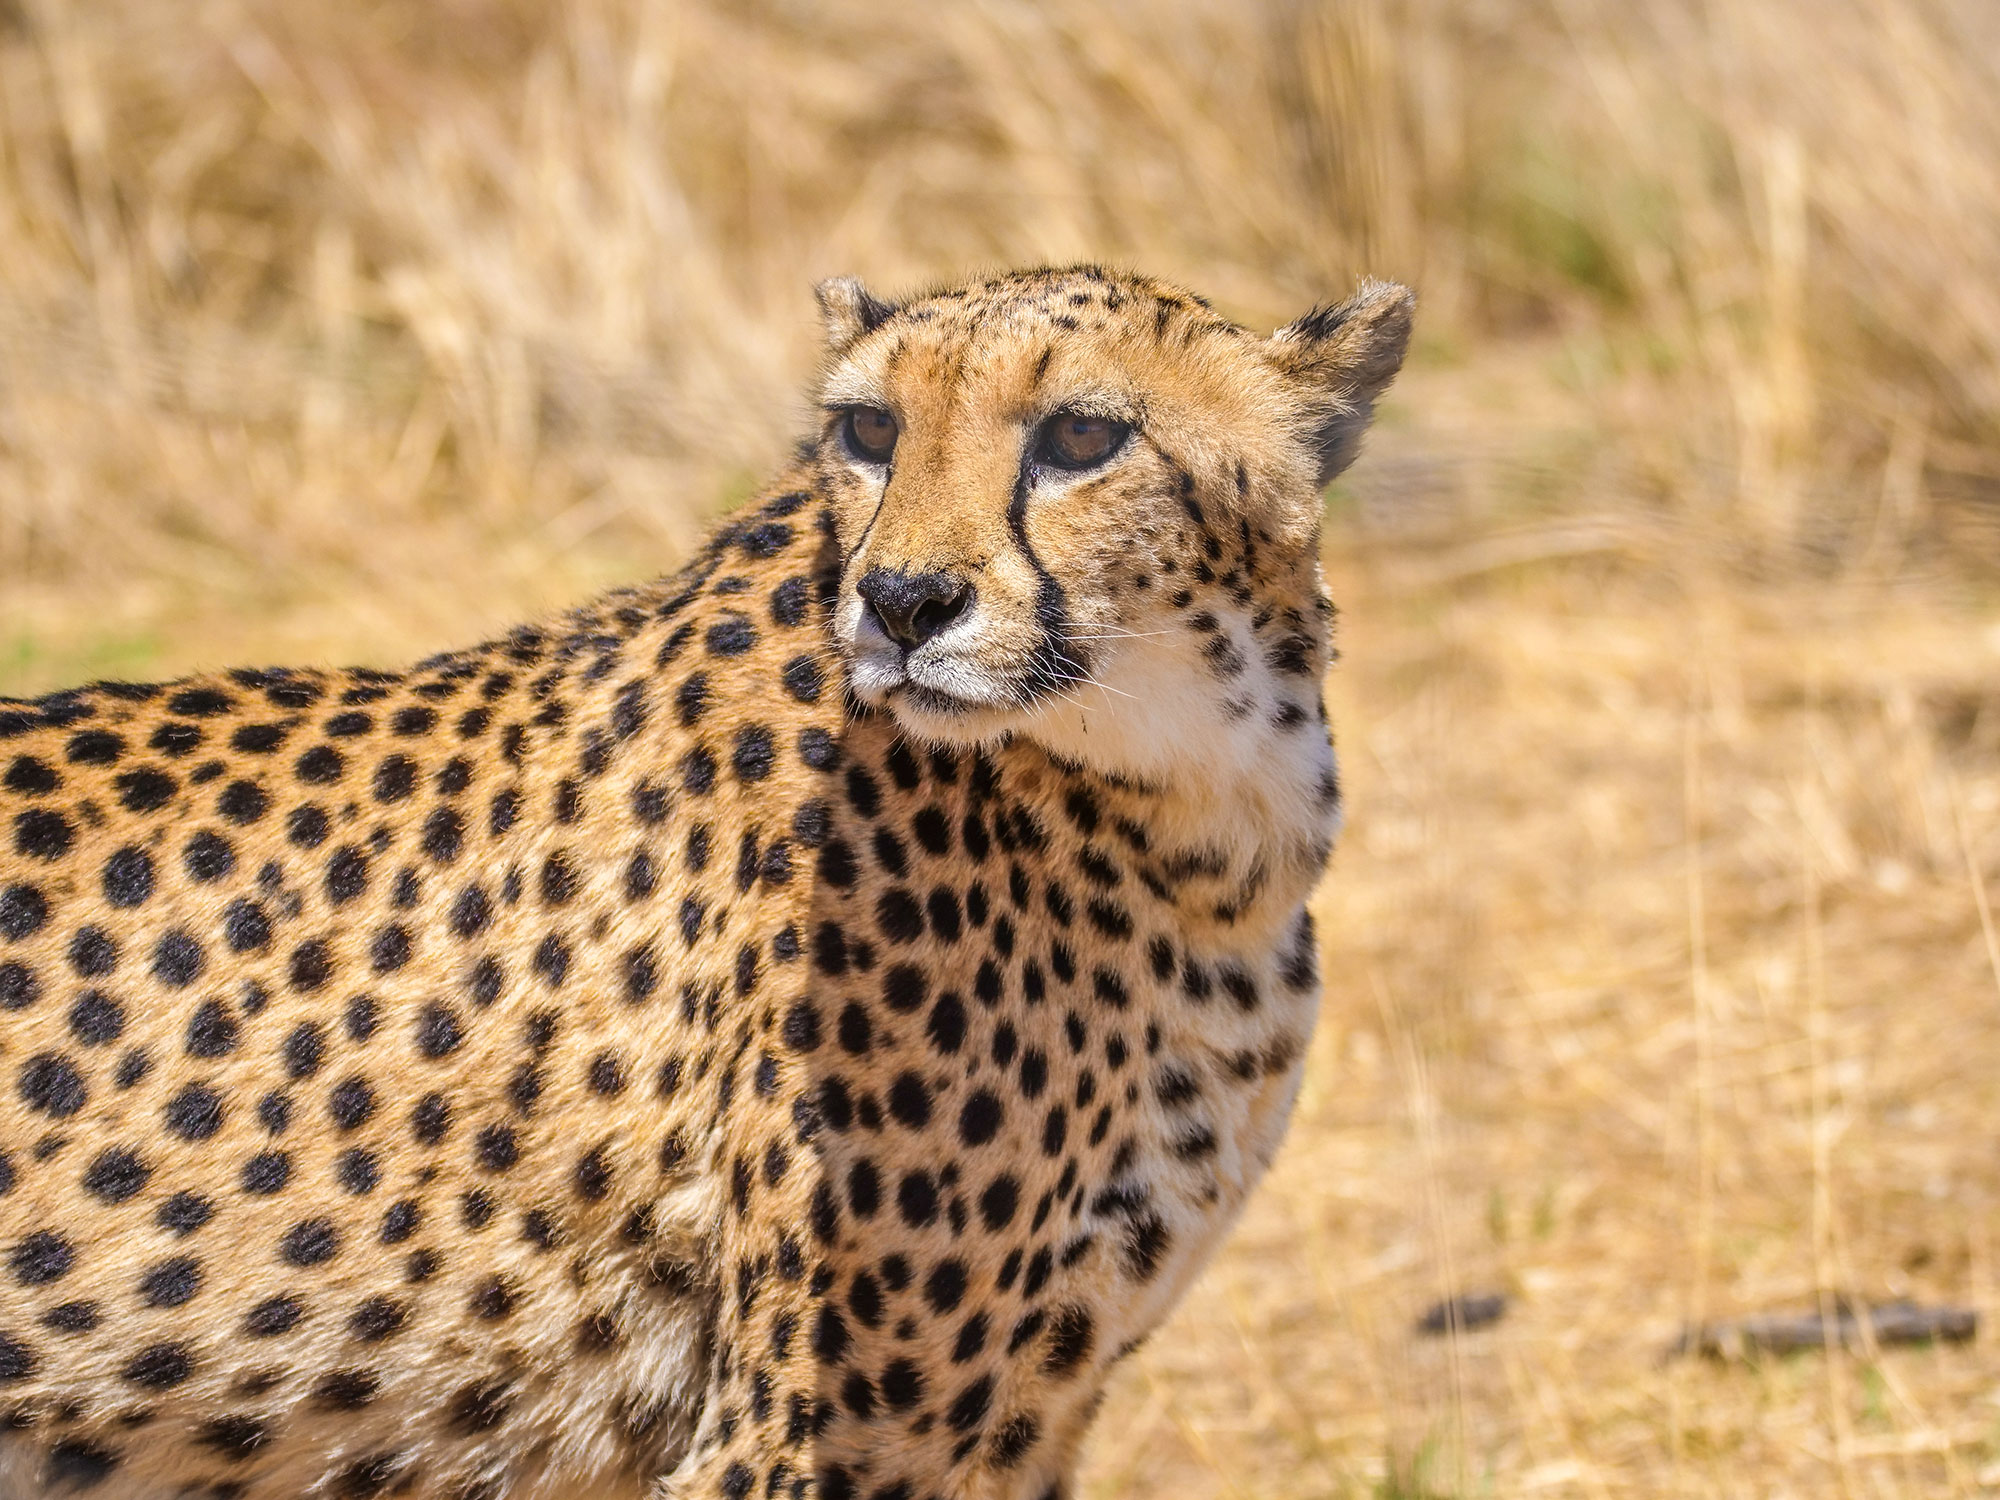 Cheetah at N/a'an ku sê (Naankuse) Wildlife Sanctuary in Namibia, Africa